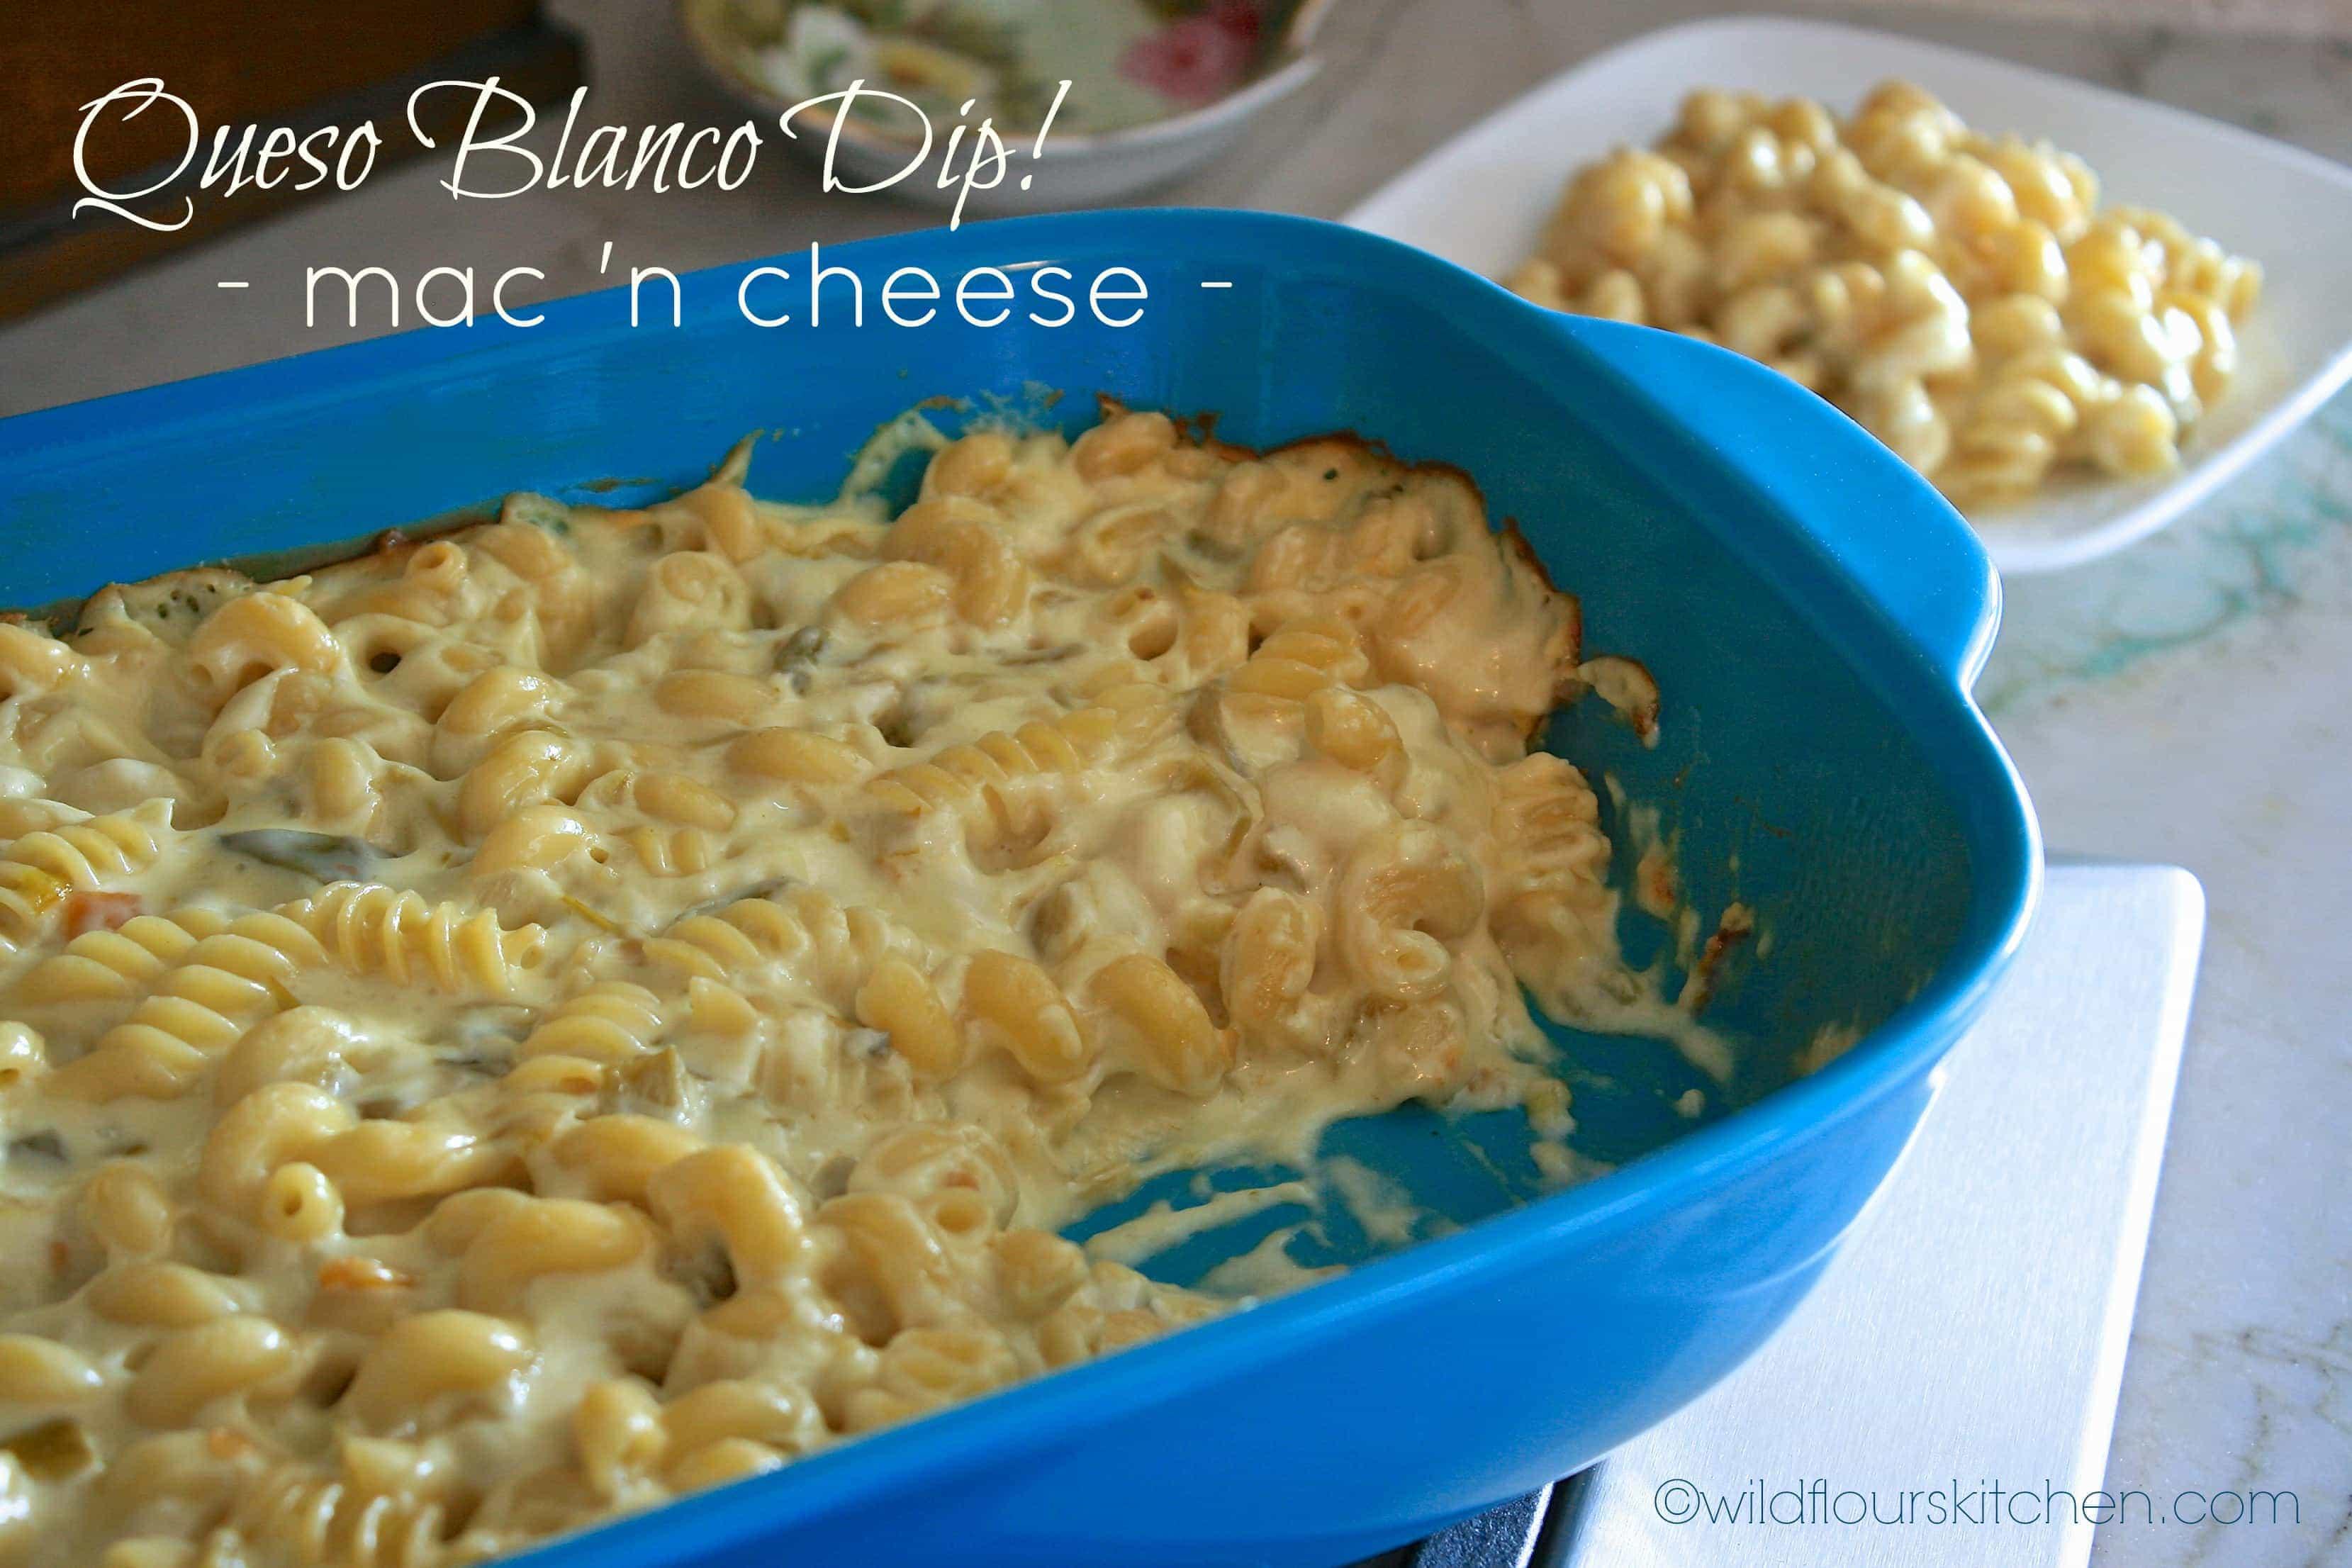 Queso Blanco Dip Mac 'n Cheese! - Wildflour's Cottage Kitchen